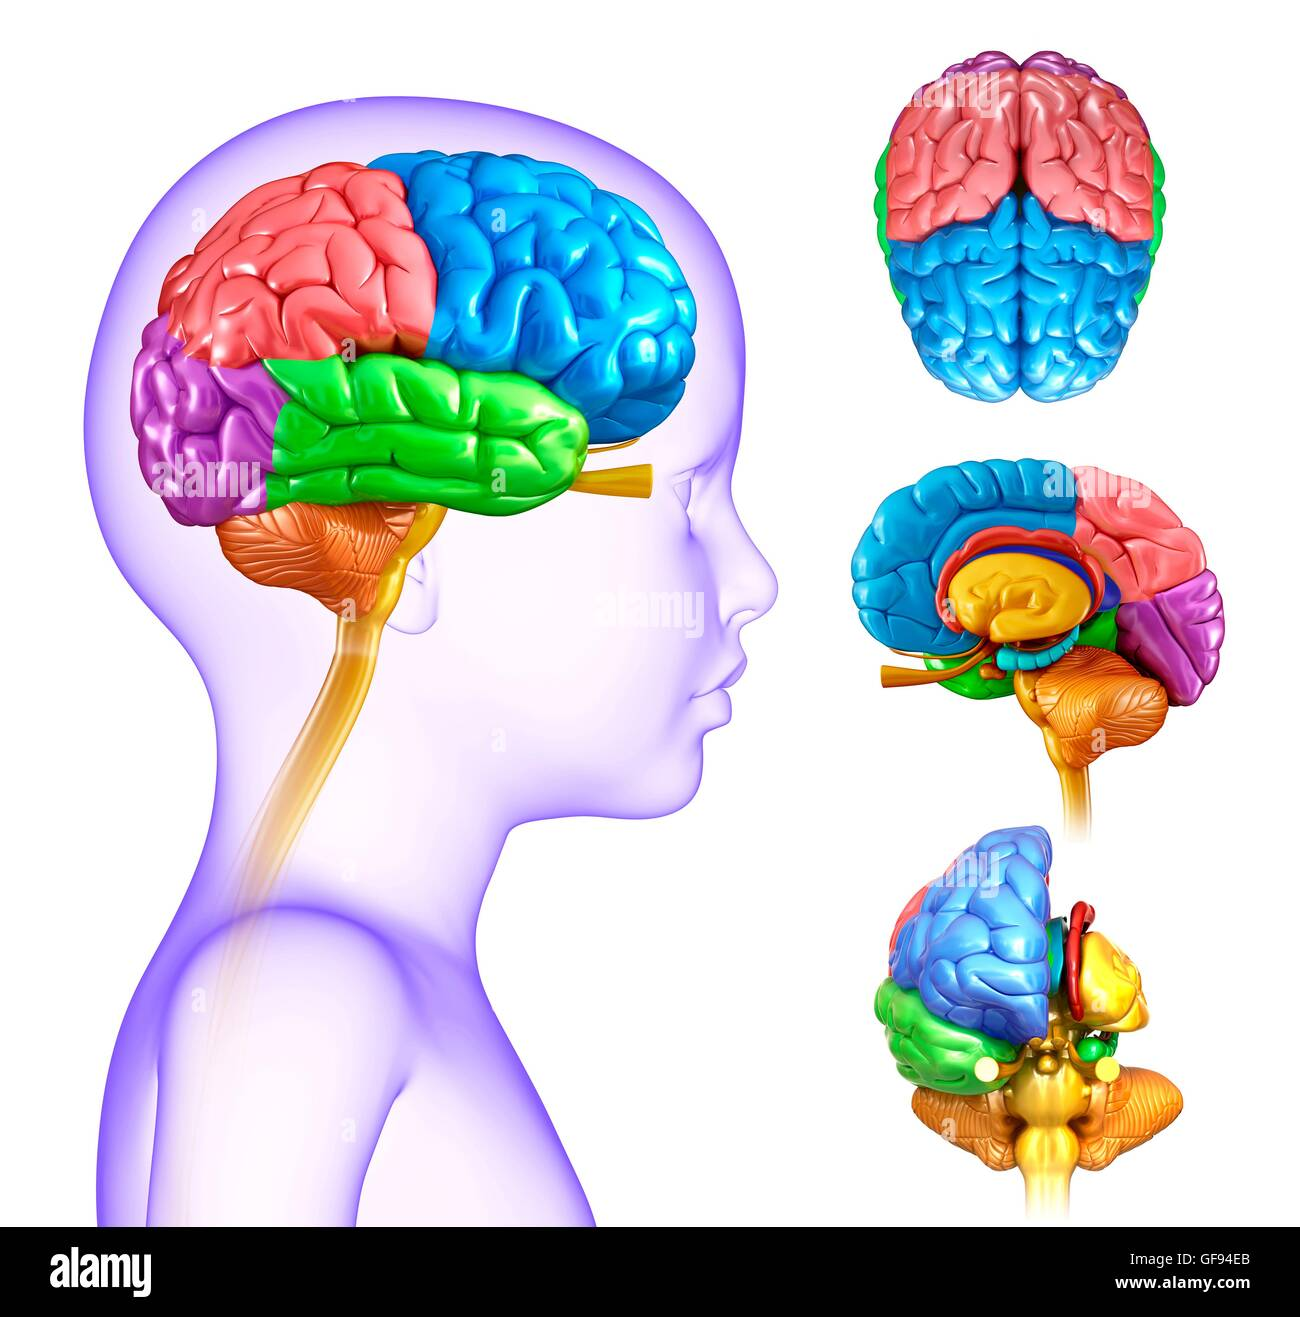 Childs Brain Anatomy Stockfotos & Childs Brain Anatomy Bilder - Alamy